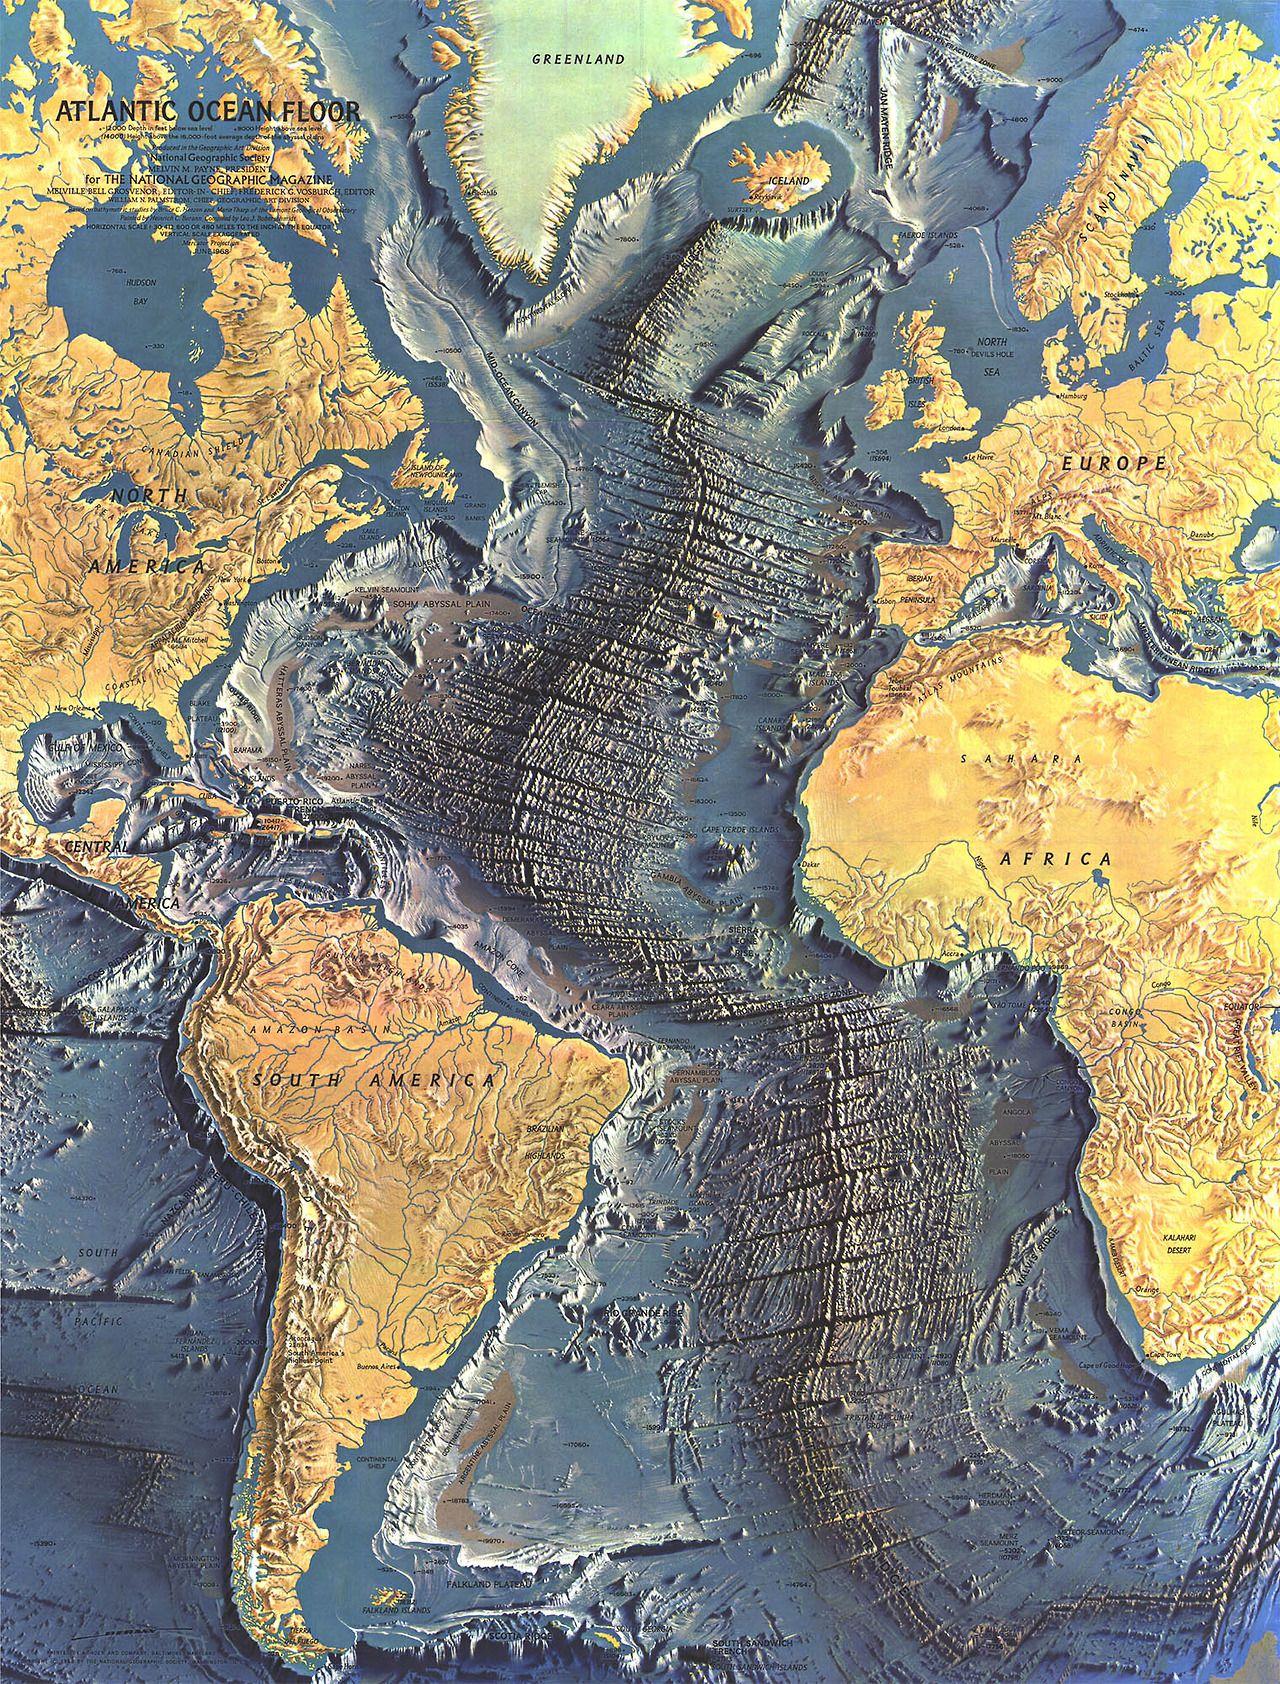 Beautiful Topography Map Of The Atlantic Sea Floor The